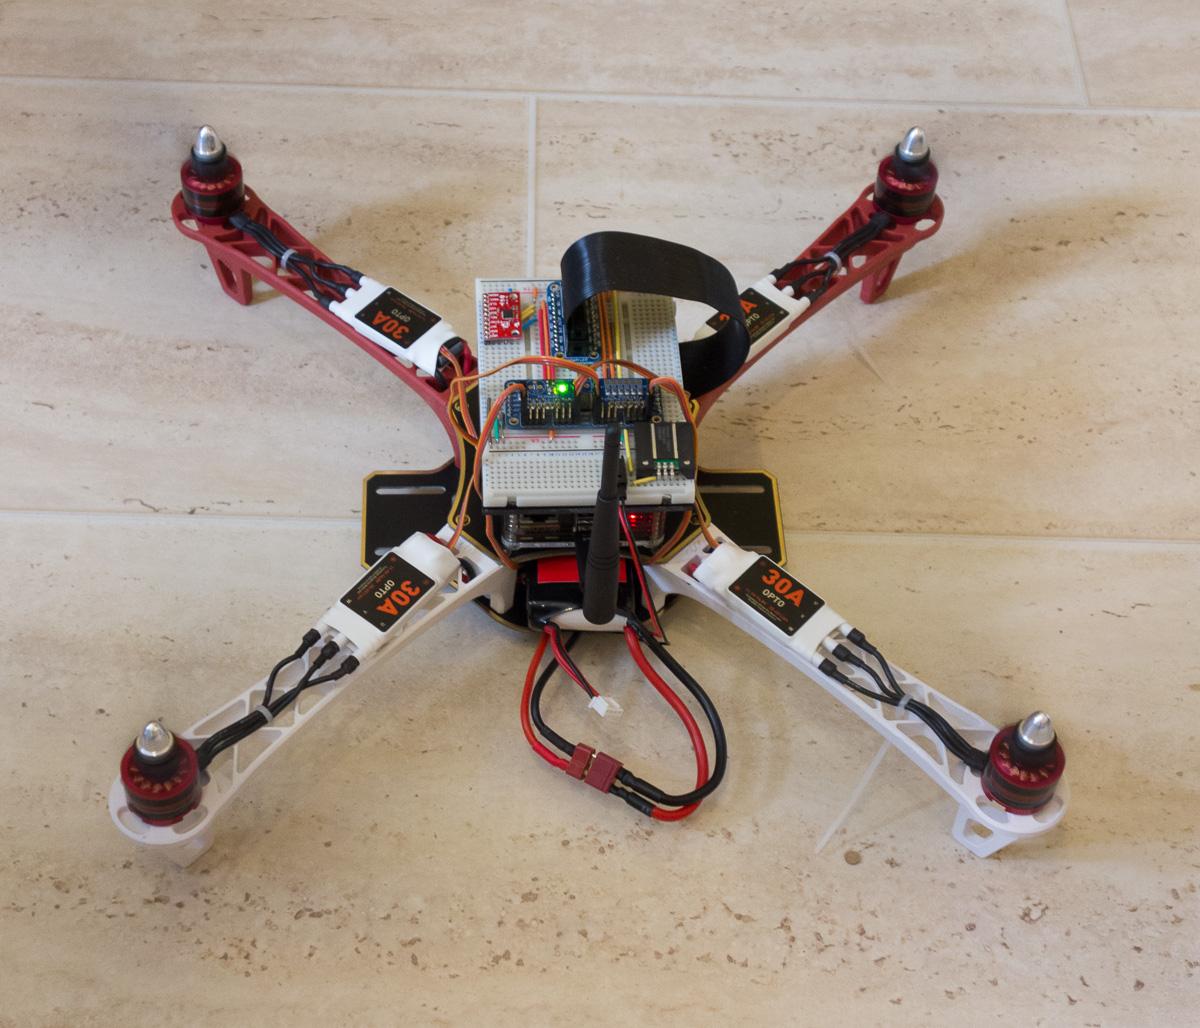 Quadcopter with the raspberrypi skyspy raspberry pi pod